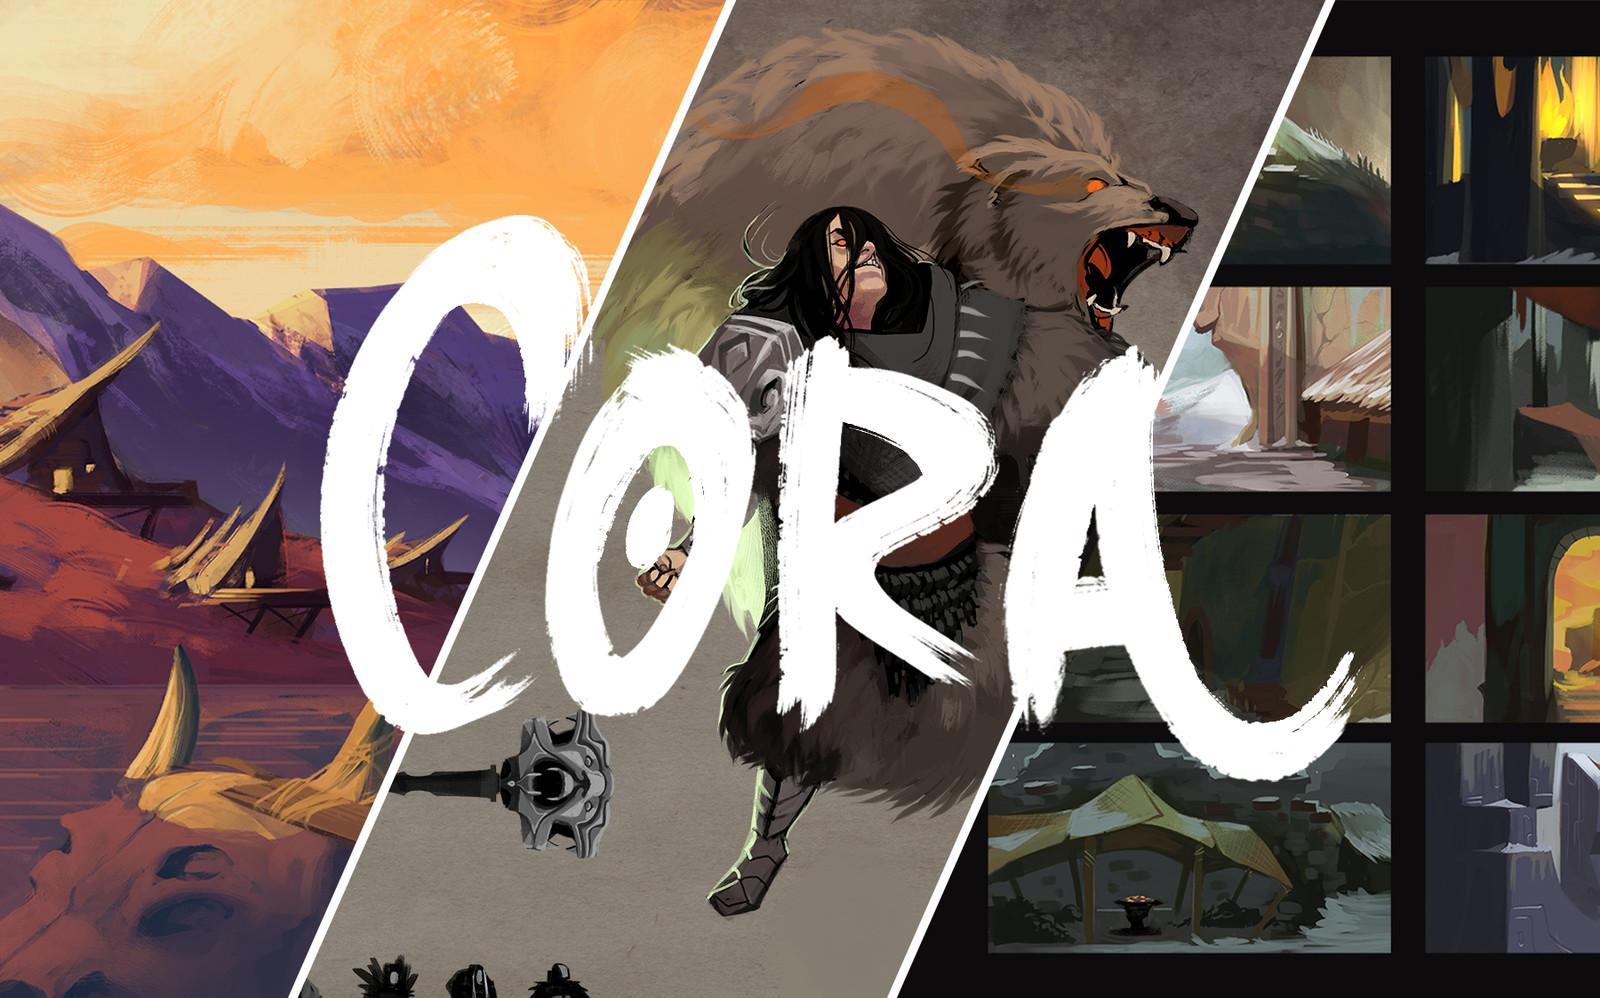 Cora Visual Development